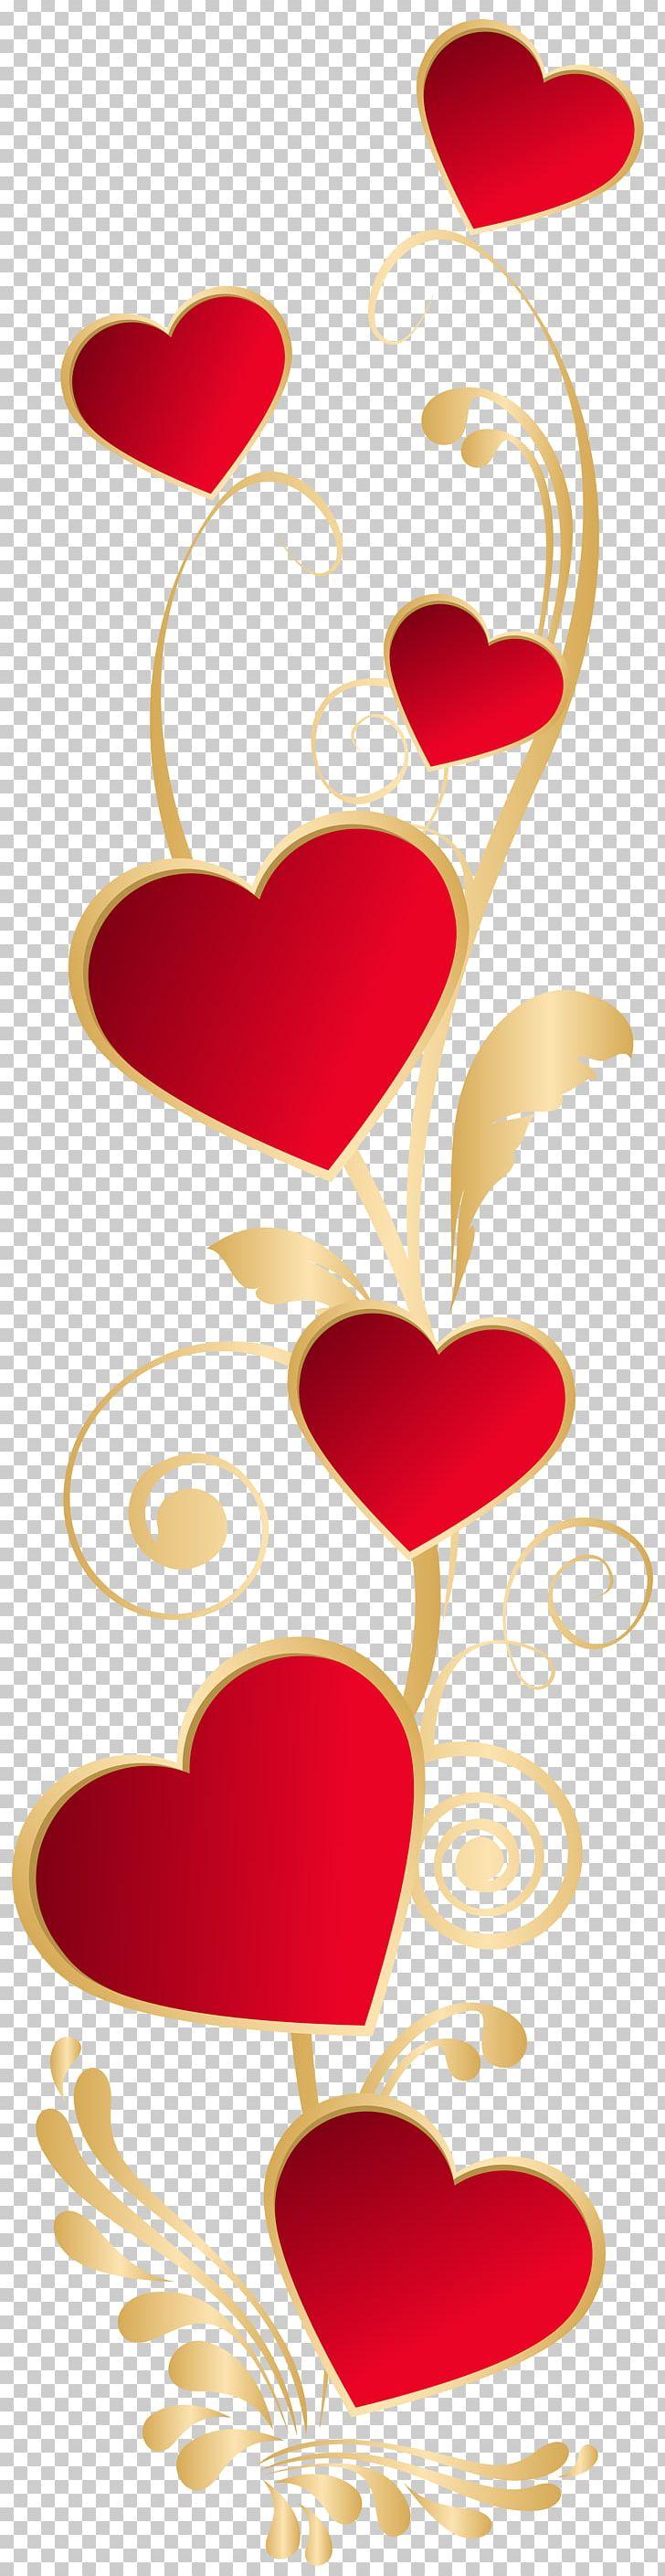 Heart Valentine's Day PNG, Clipart, Art, Clipart, Clip Art.